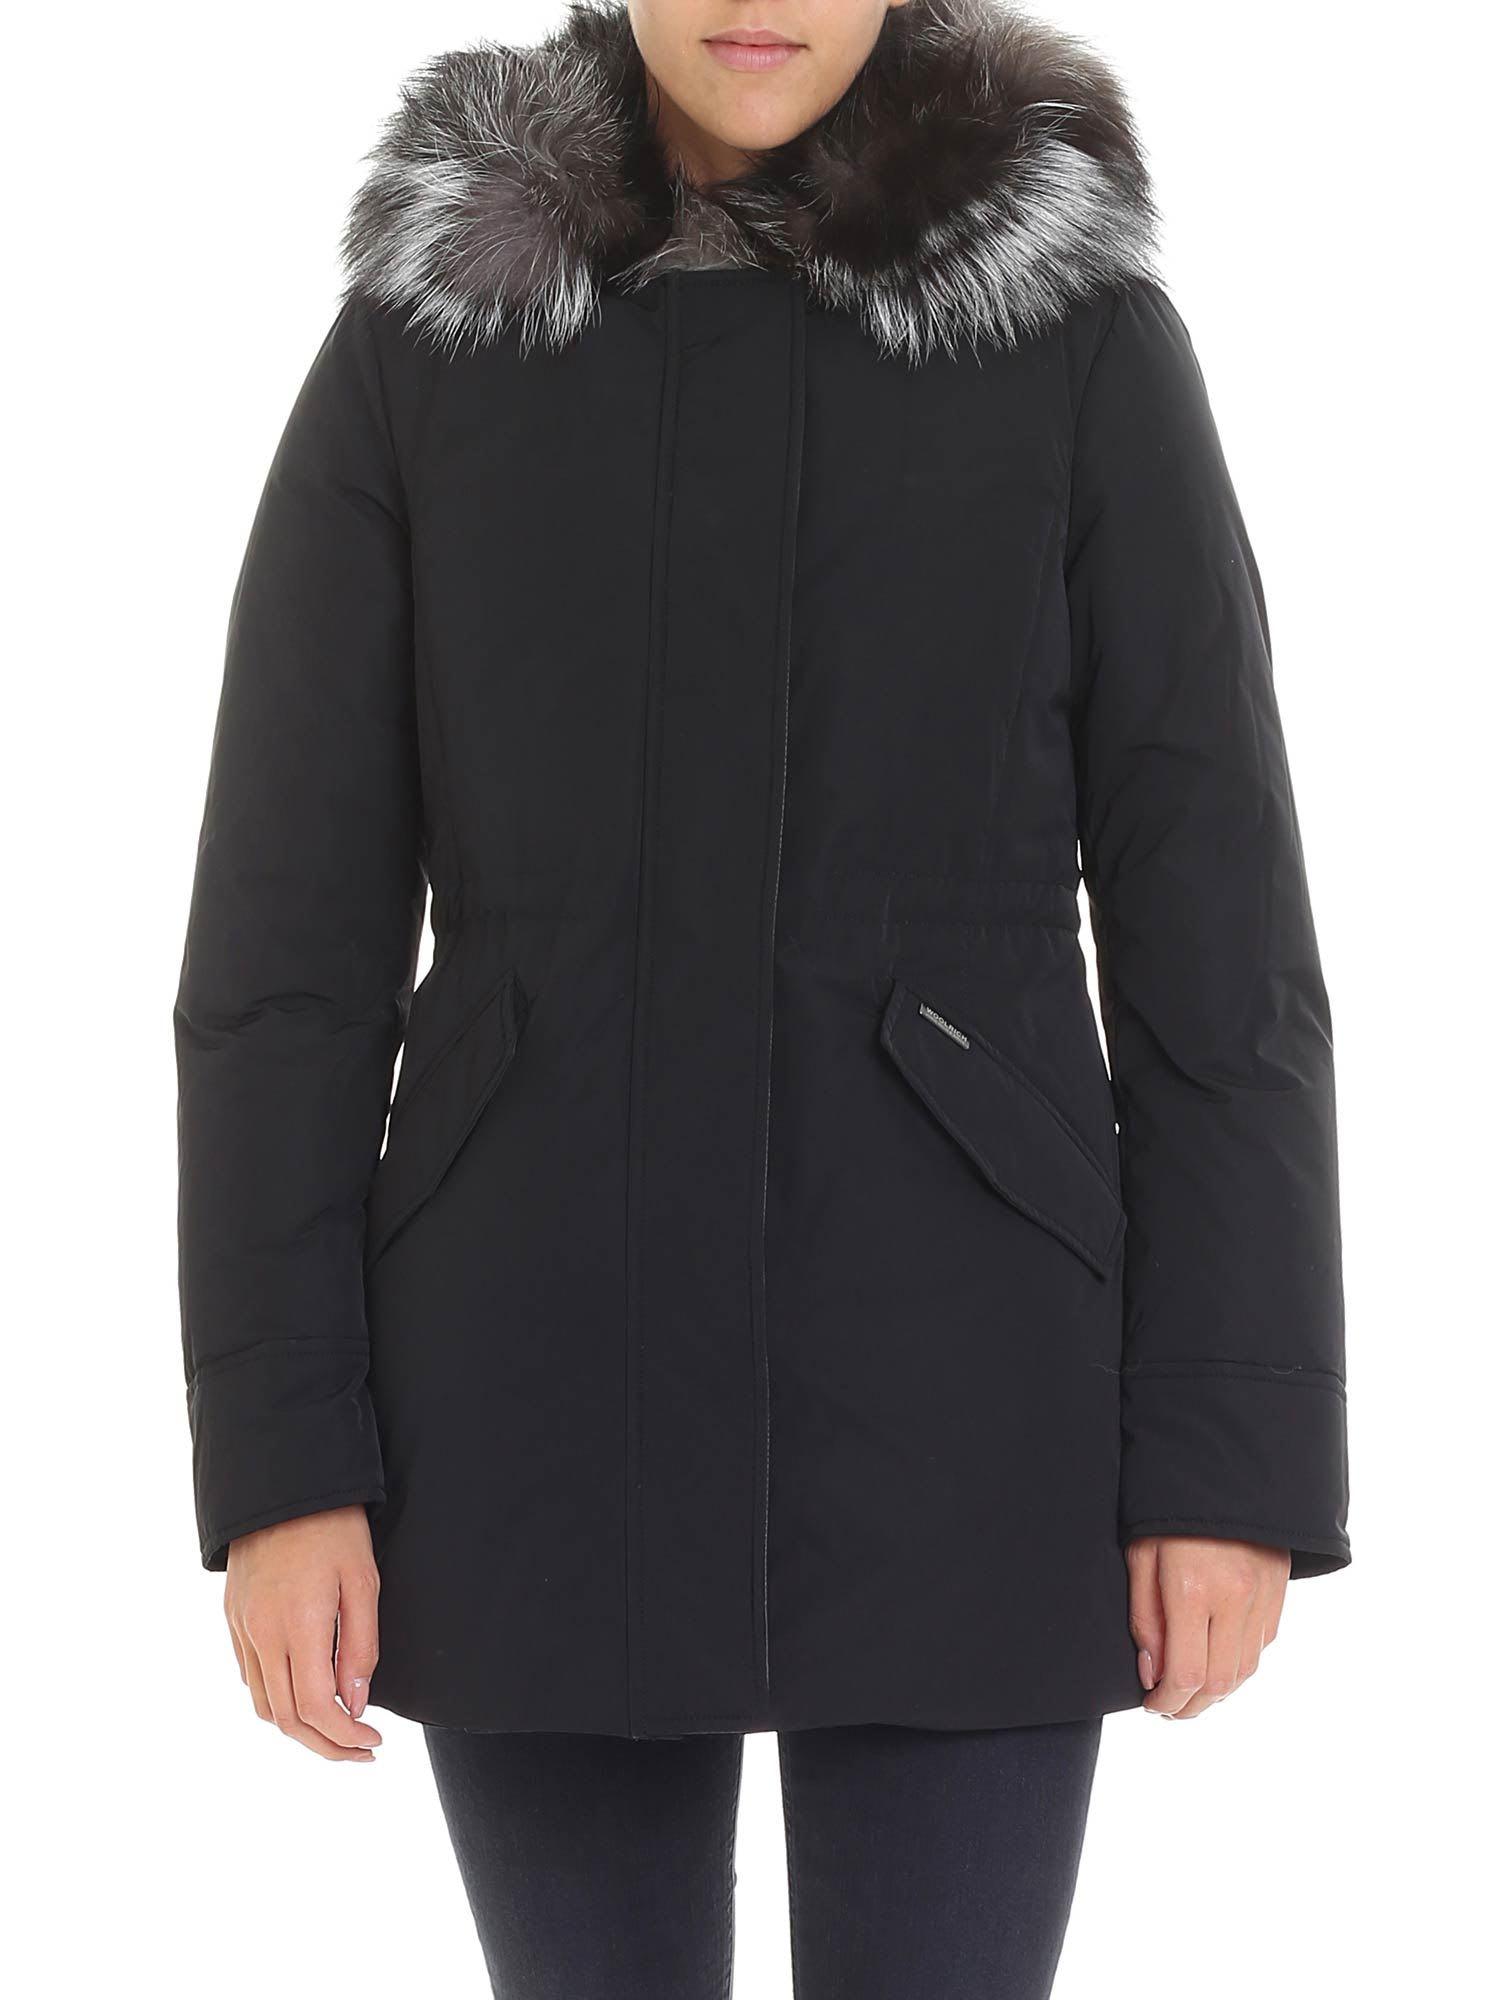 Woolrich – Somerset Down Jacket